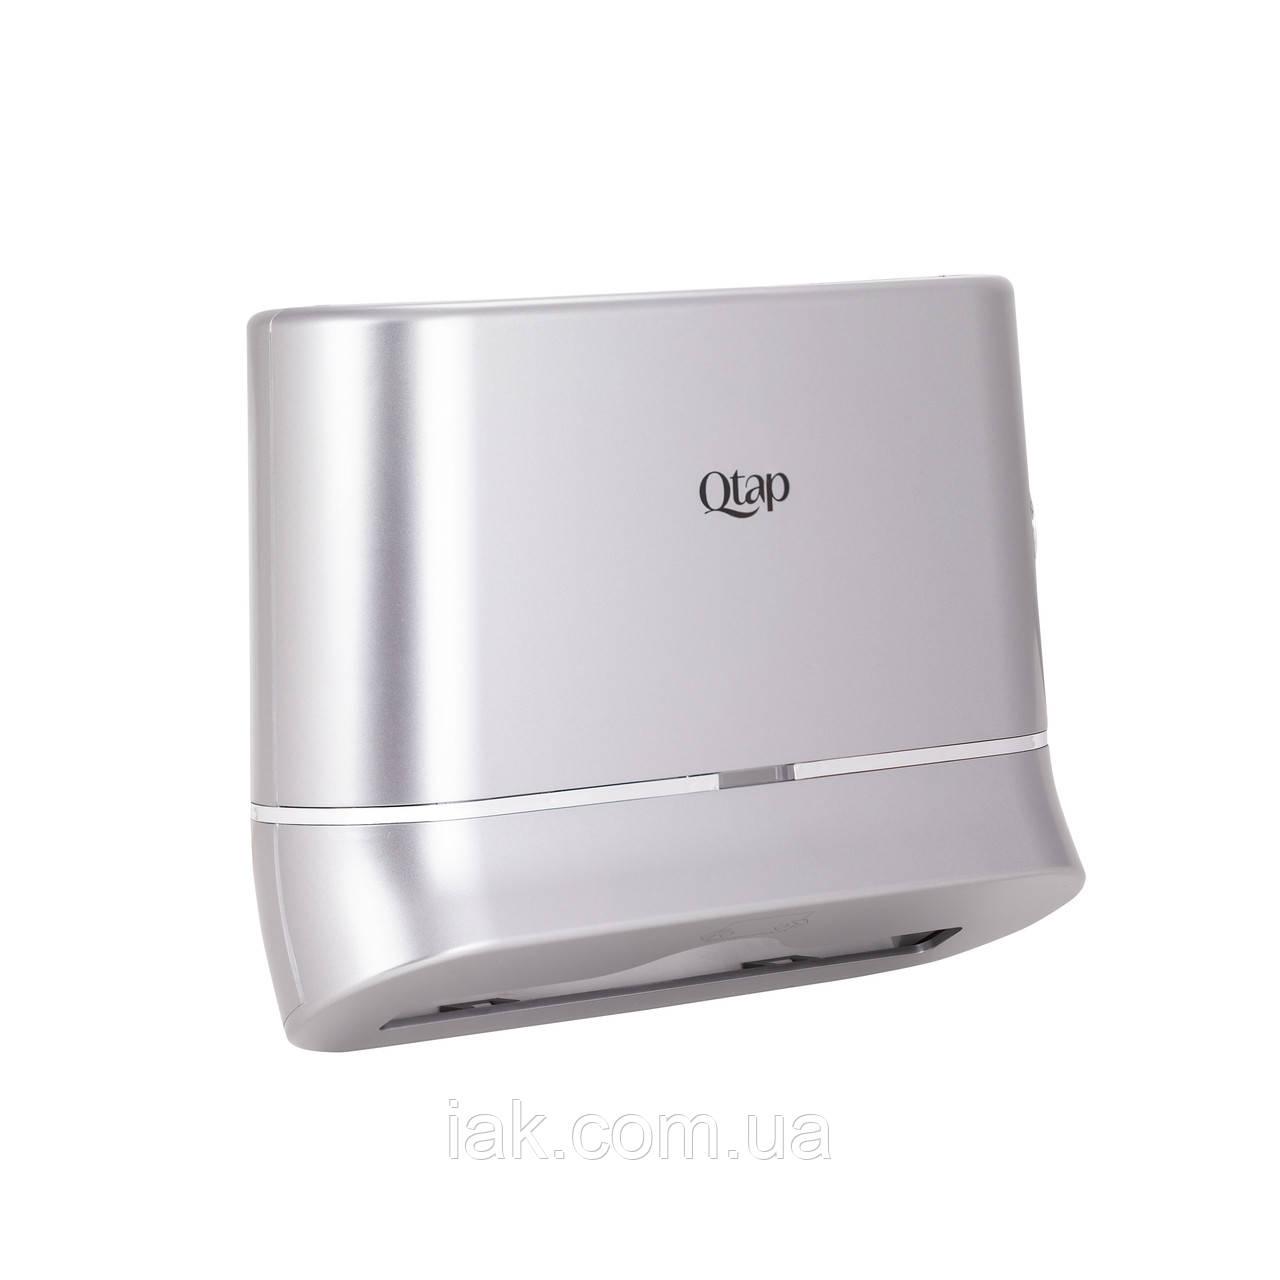 Тримач для паперових рушників Qtap Drzak na Rucniky DR600SP